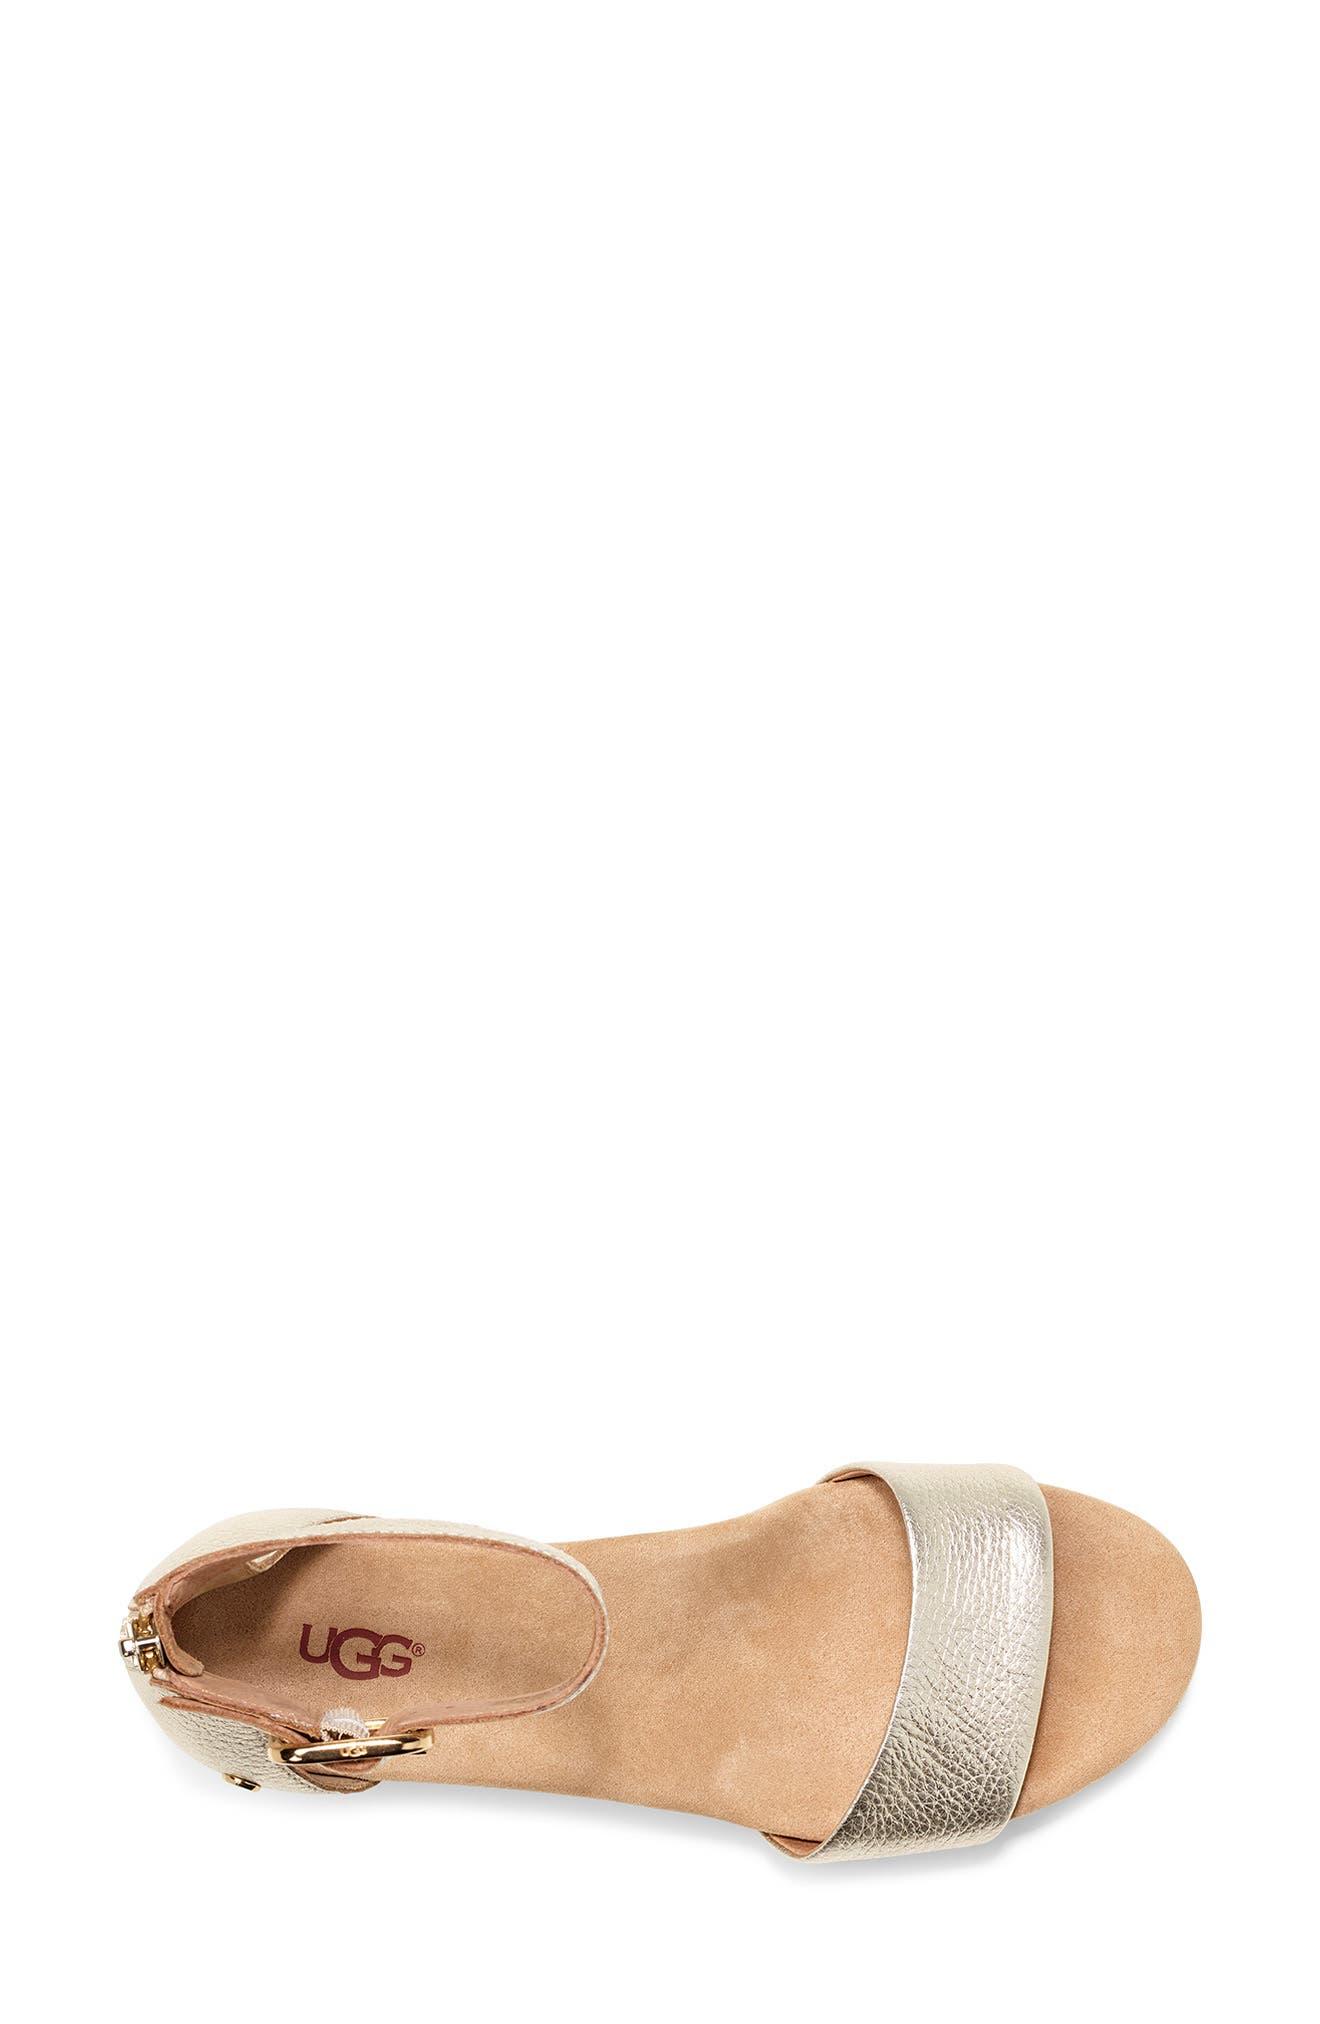 UGG<SUP>®</SUP>, Zoe II Metallic Wedge Sandal, Alternate thumbnail 4, color, GOLD LEATHER